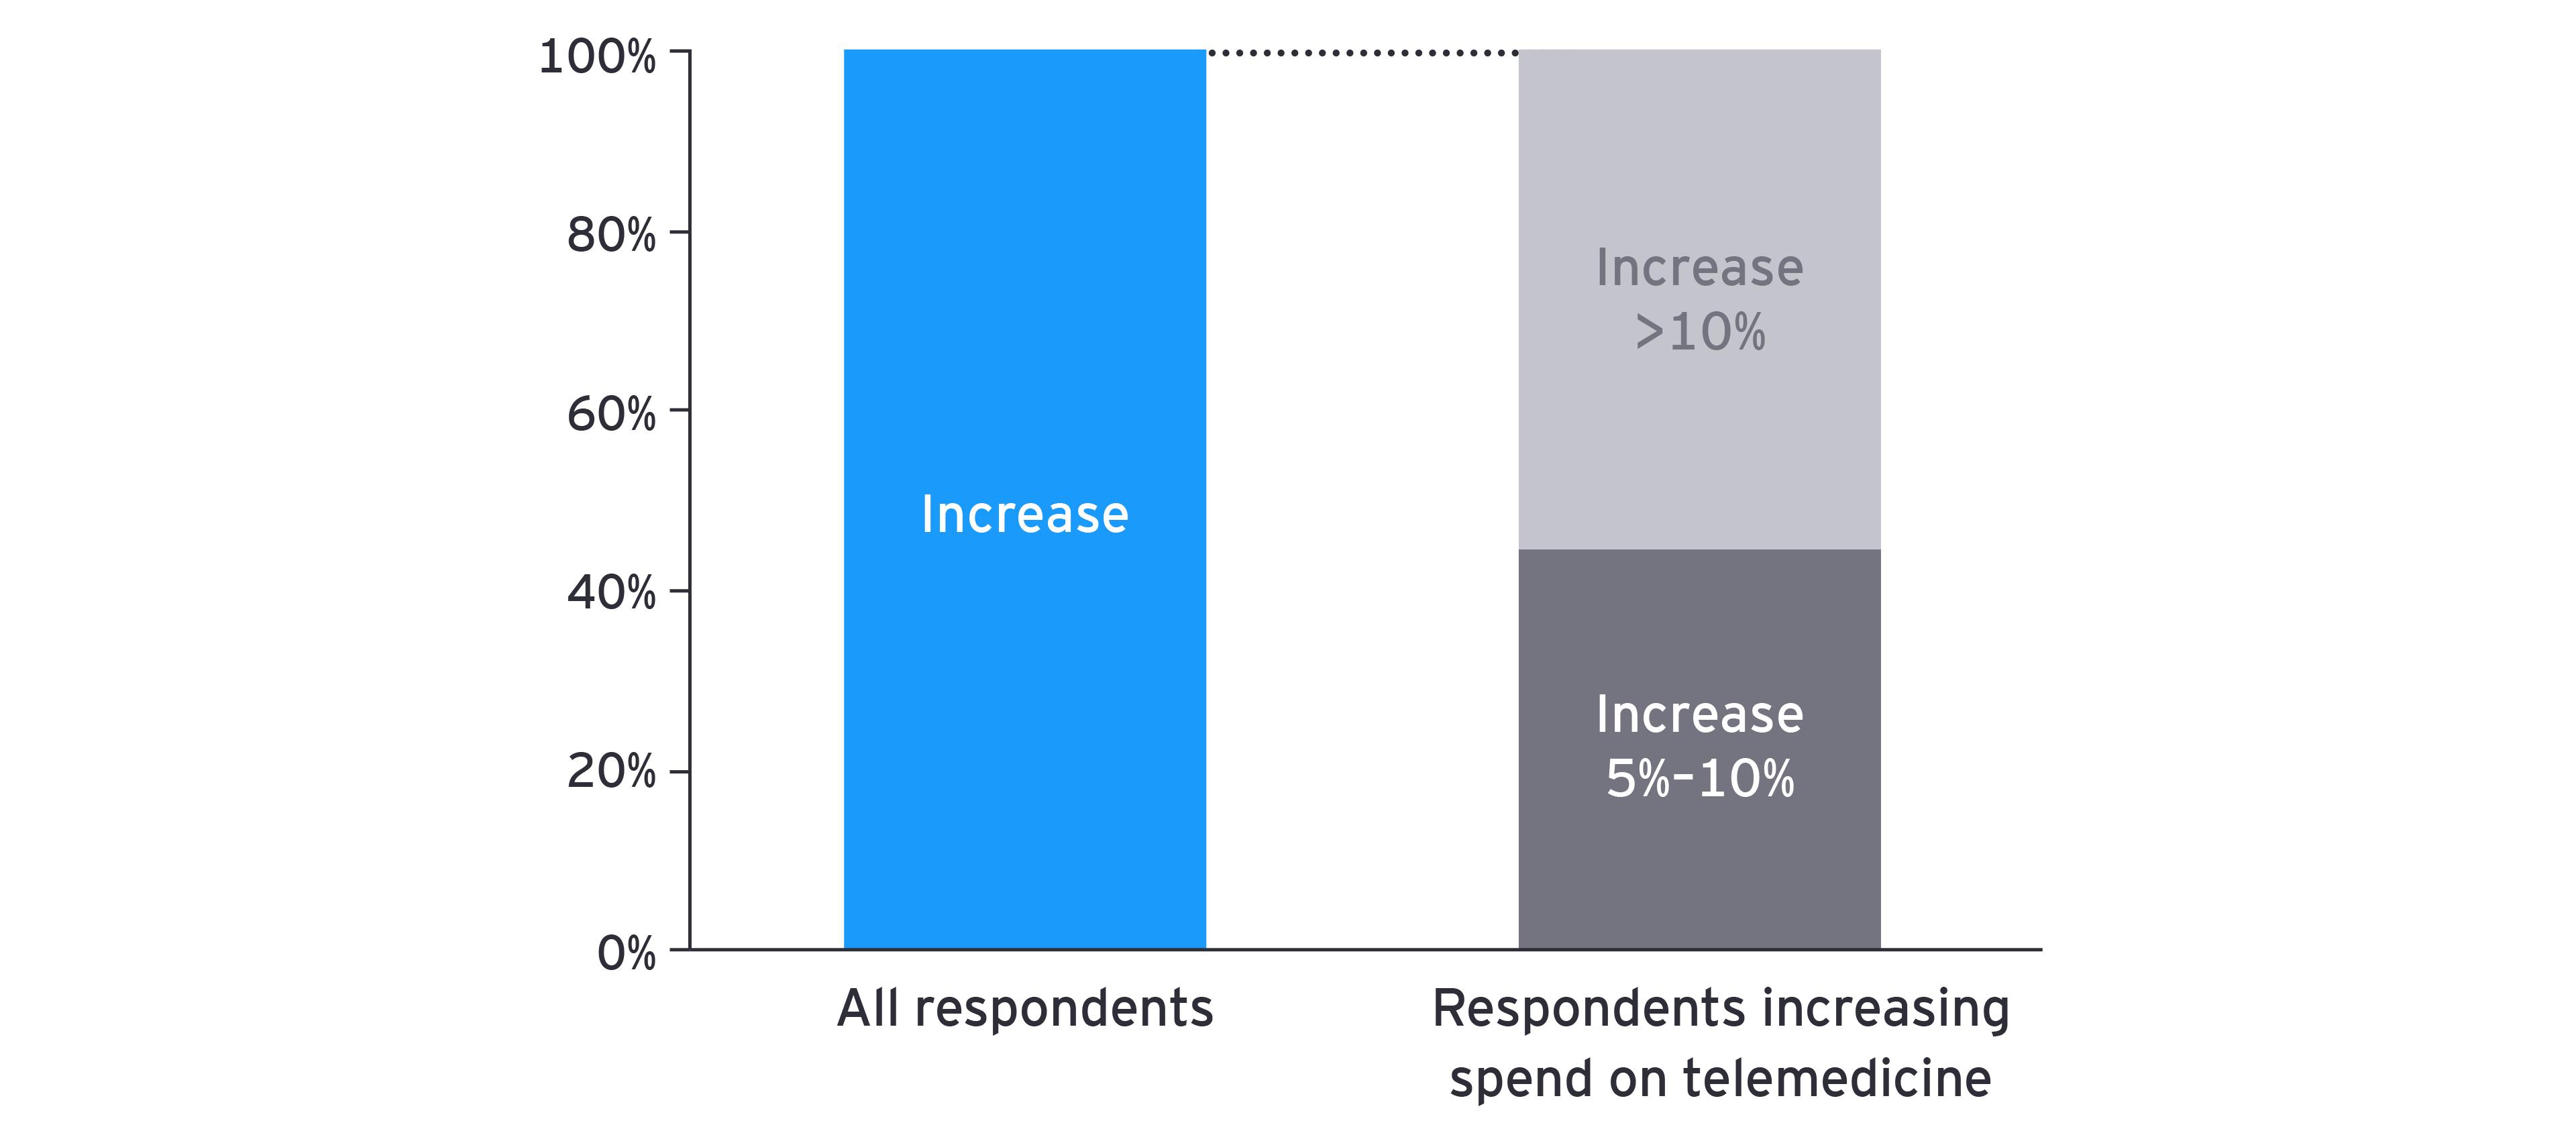 Chart: bars depicting increased spending on telemedicine